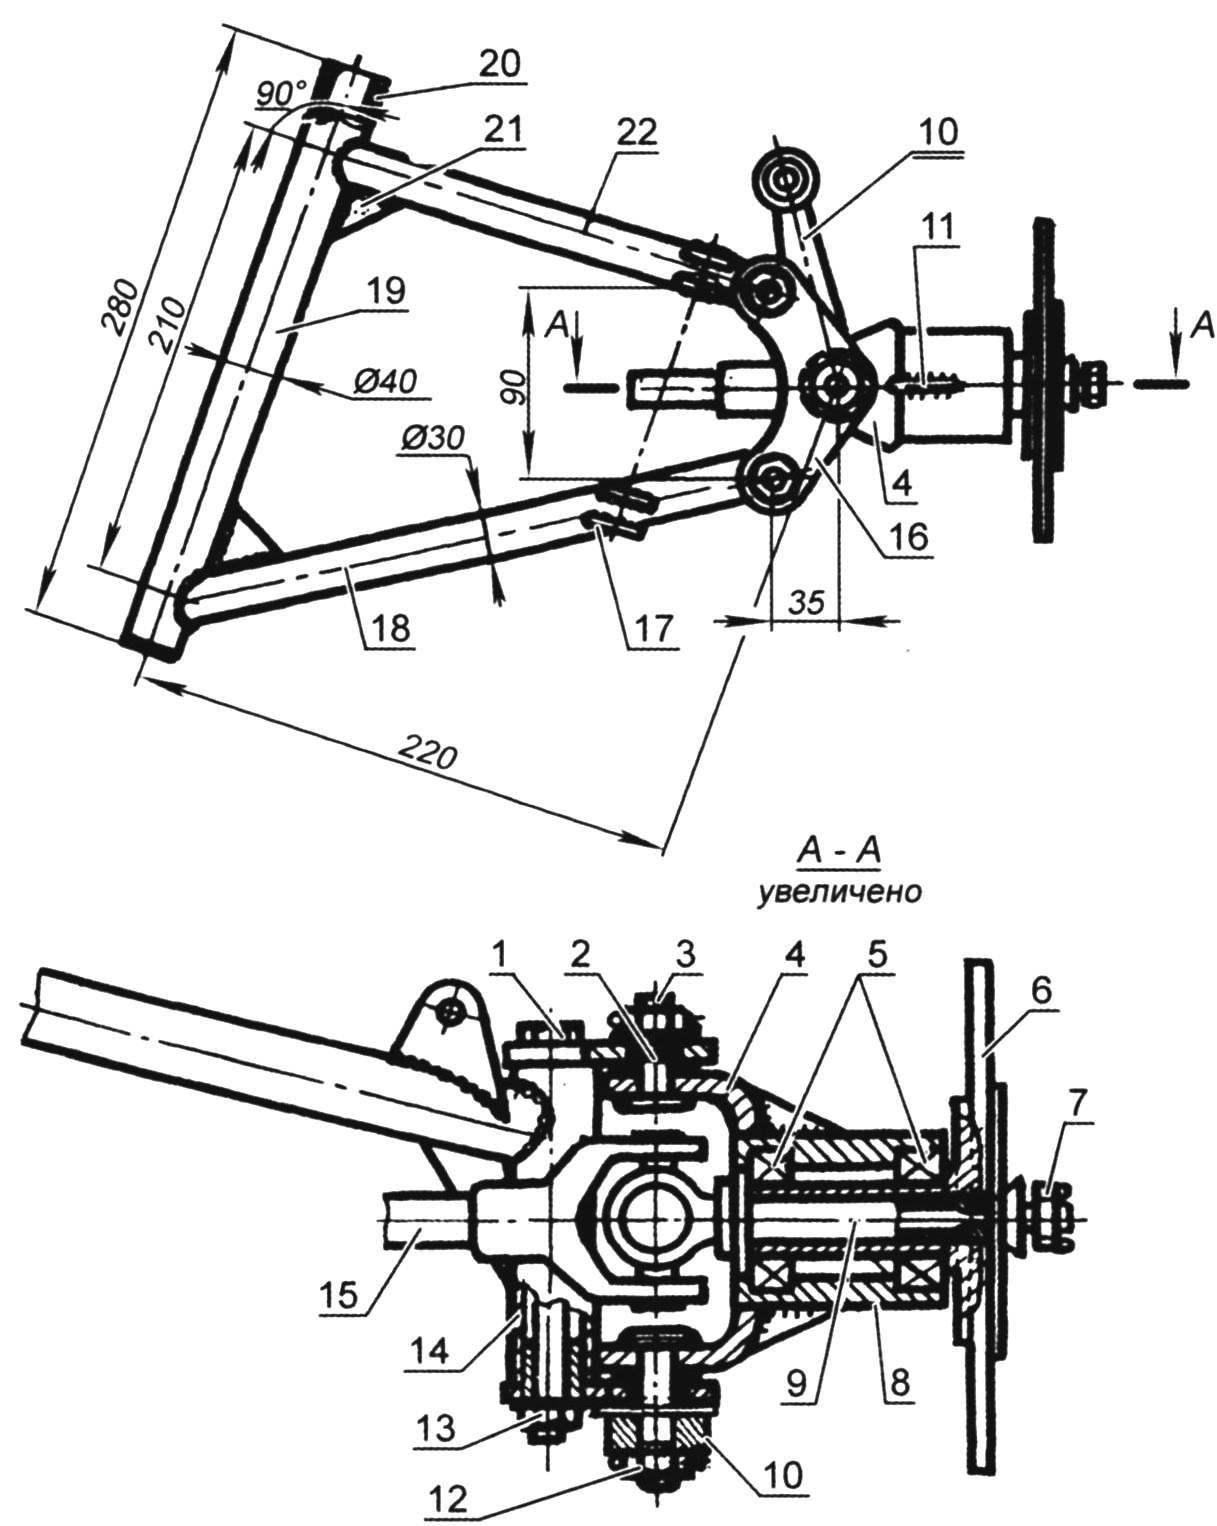 Suspension front wheel